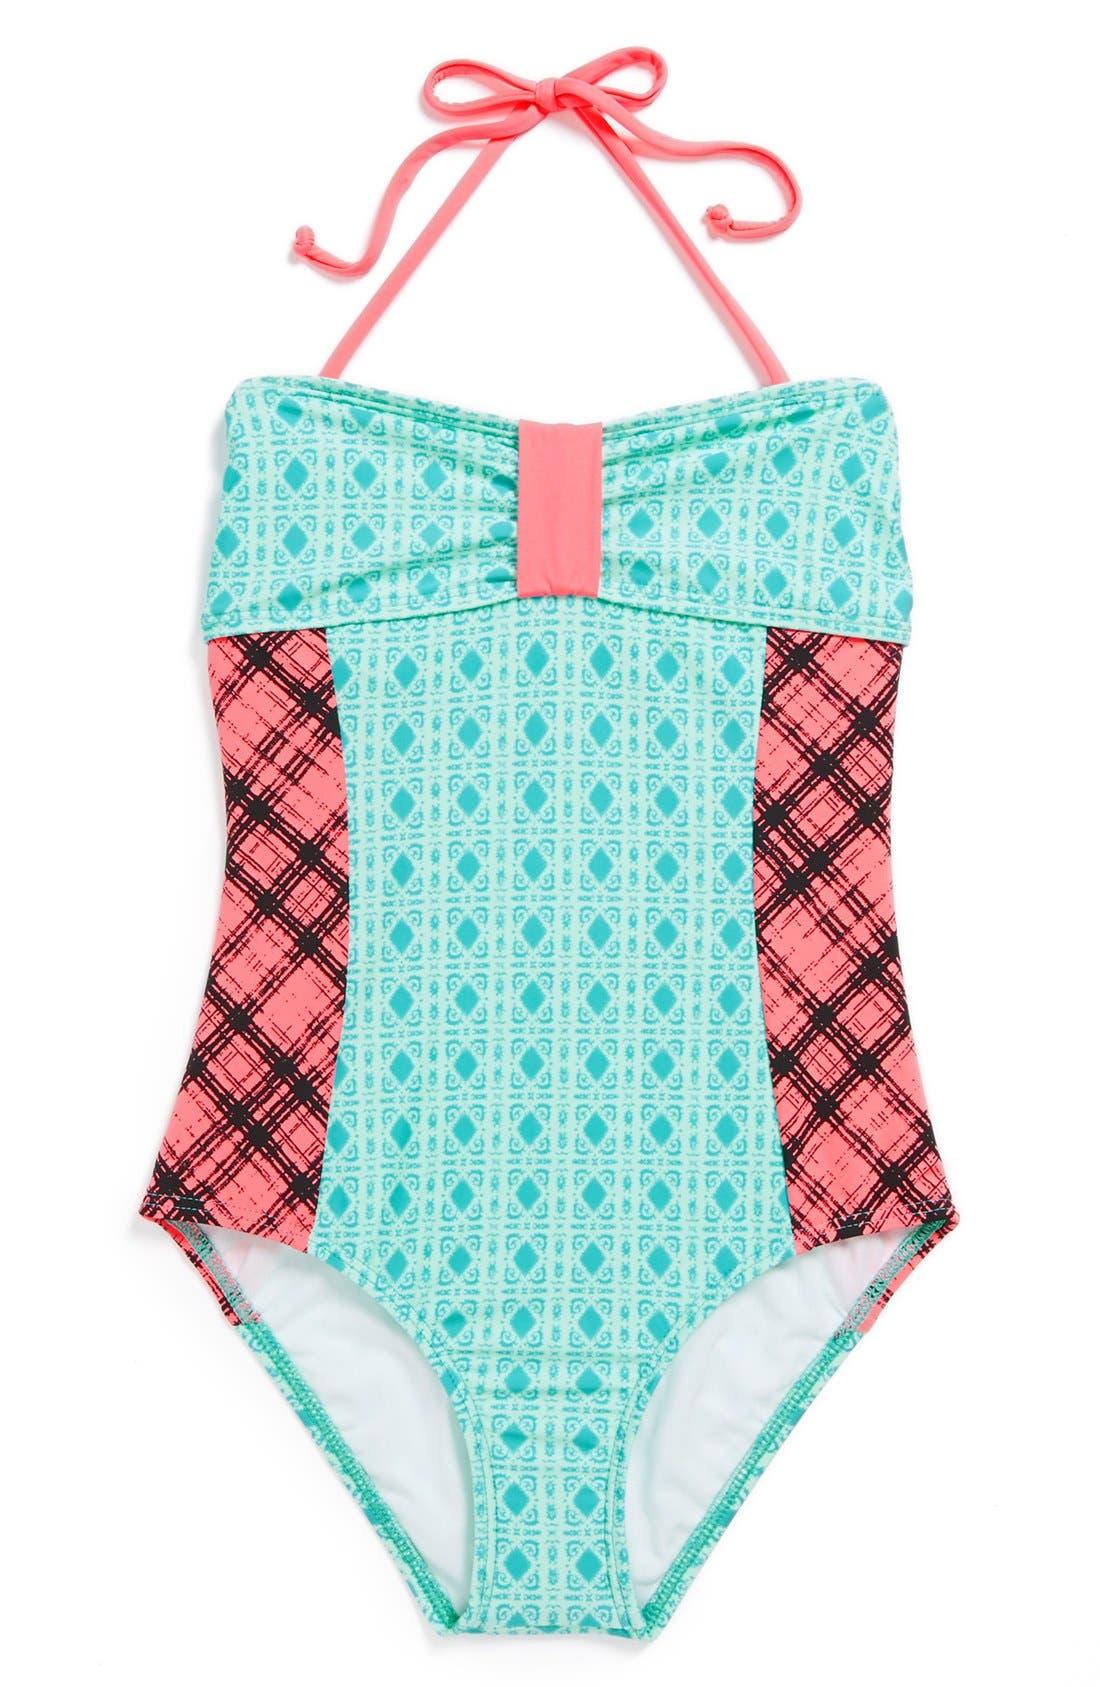 Alternate Image 1 Selected - Ella Moss Mixed Print One-Piece Swimsuit (Big Girls)